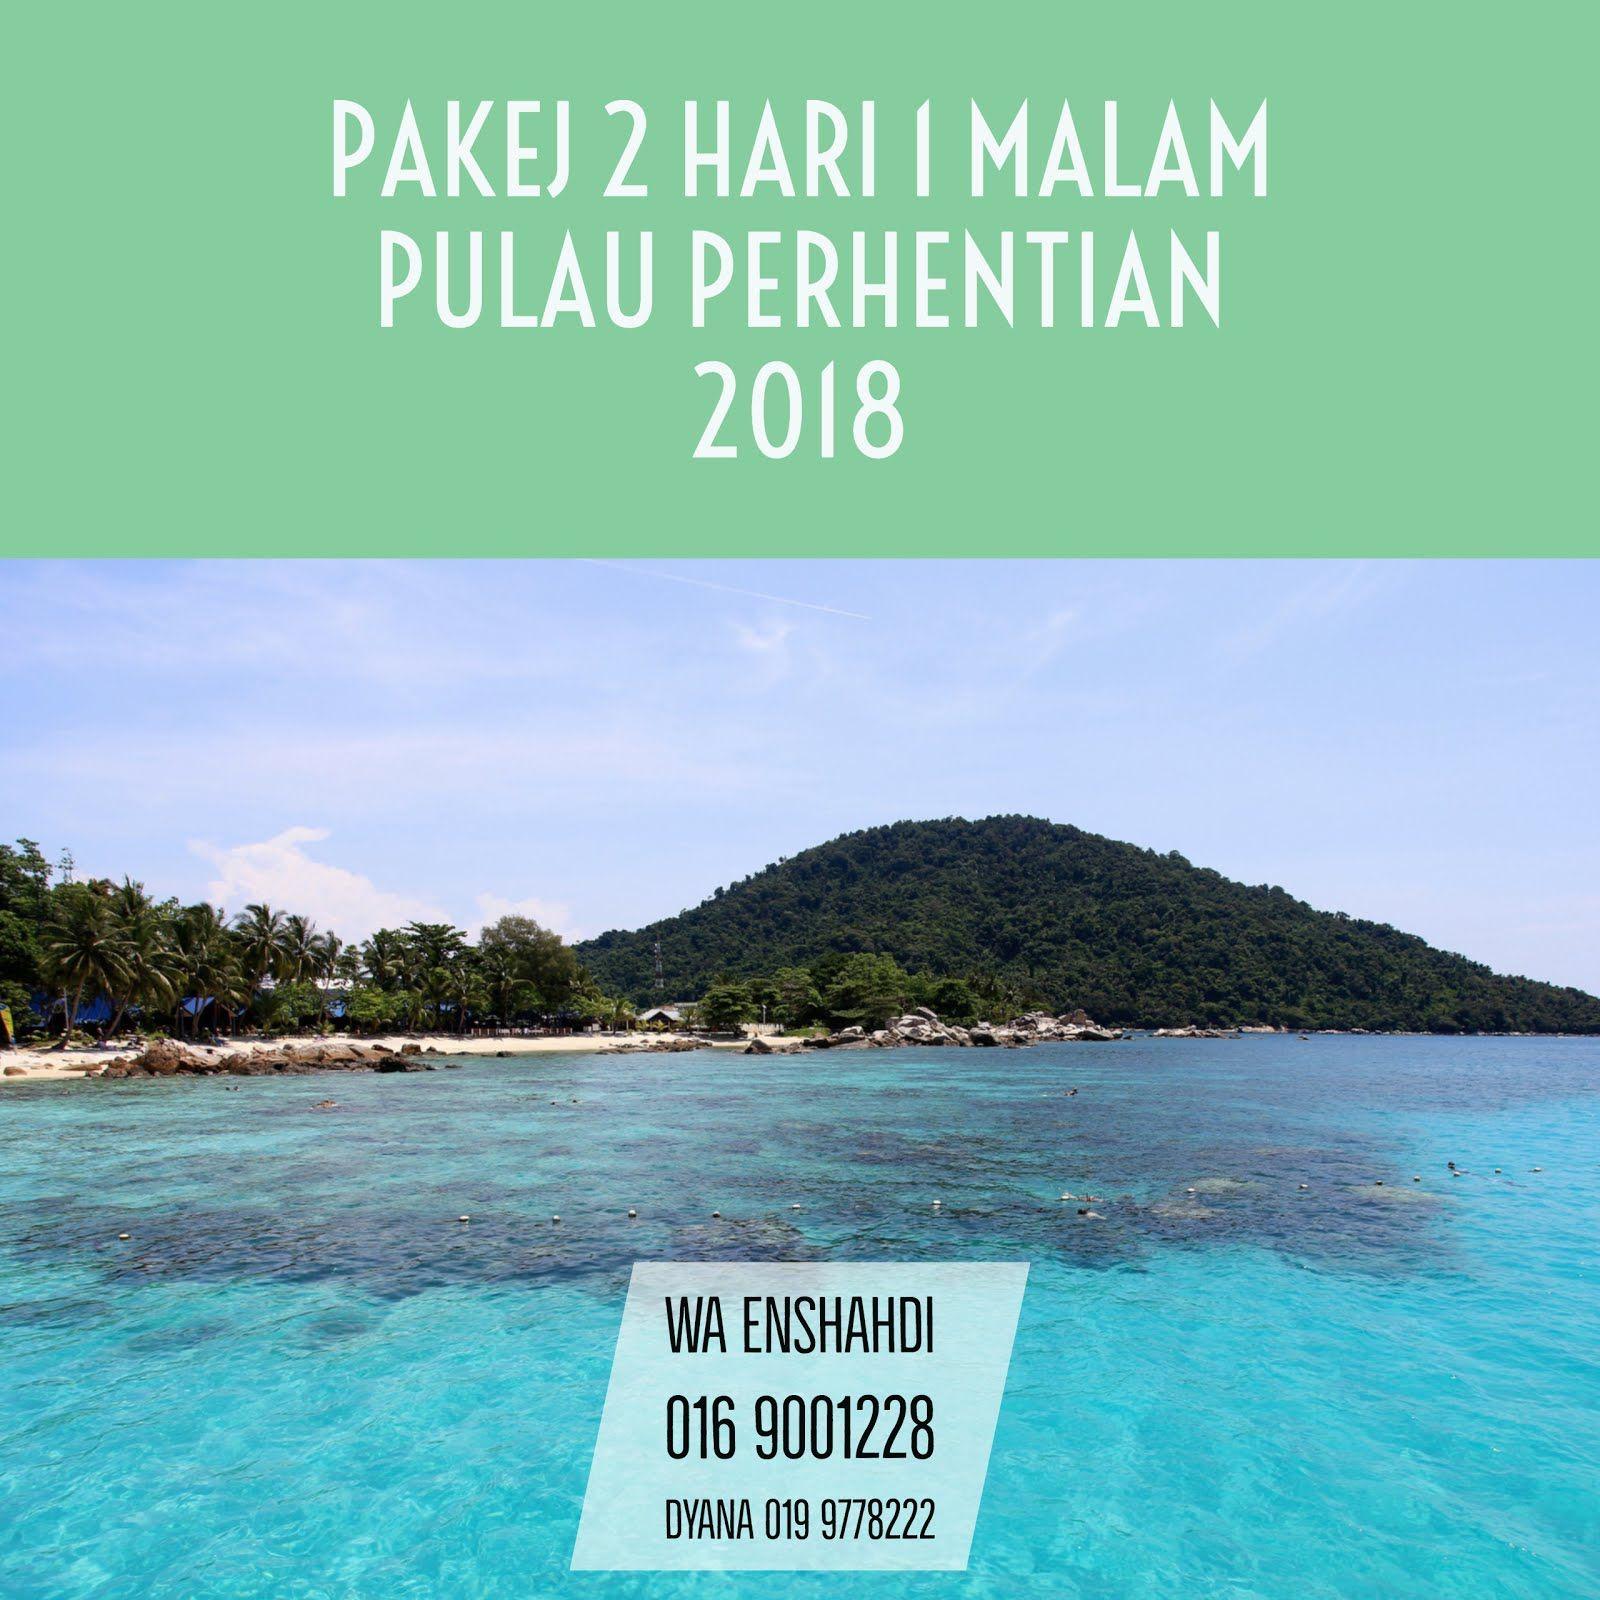 Image result for pakej LONG BEACH PULAU PERHENTIAN KECIL 2018 Pakej Long beach Pulau Perhentian Kecil 2019 Pake…